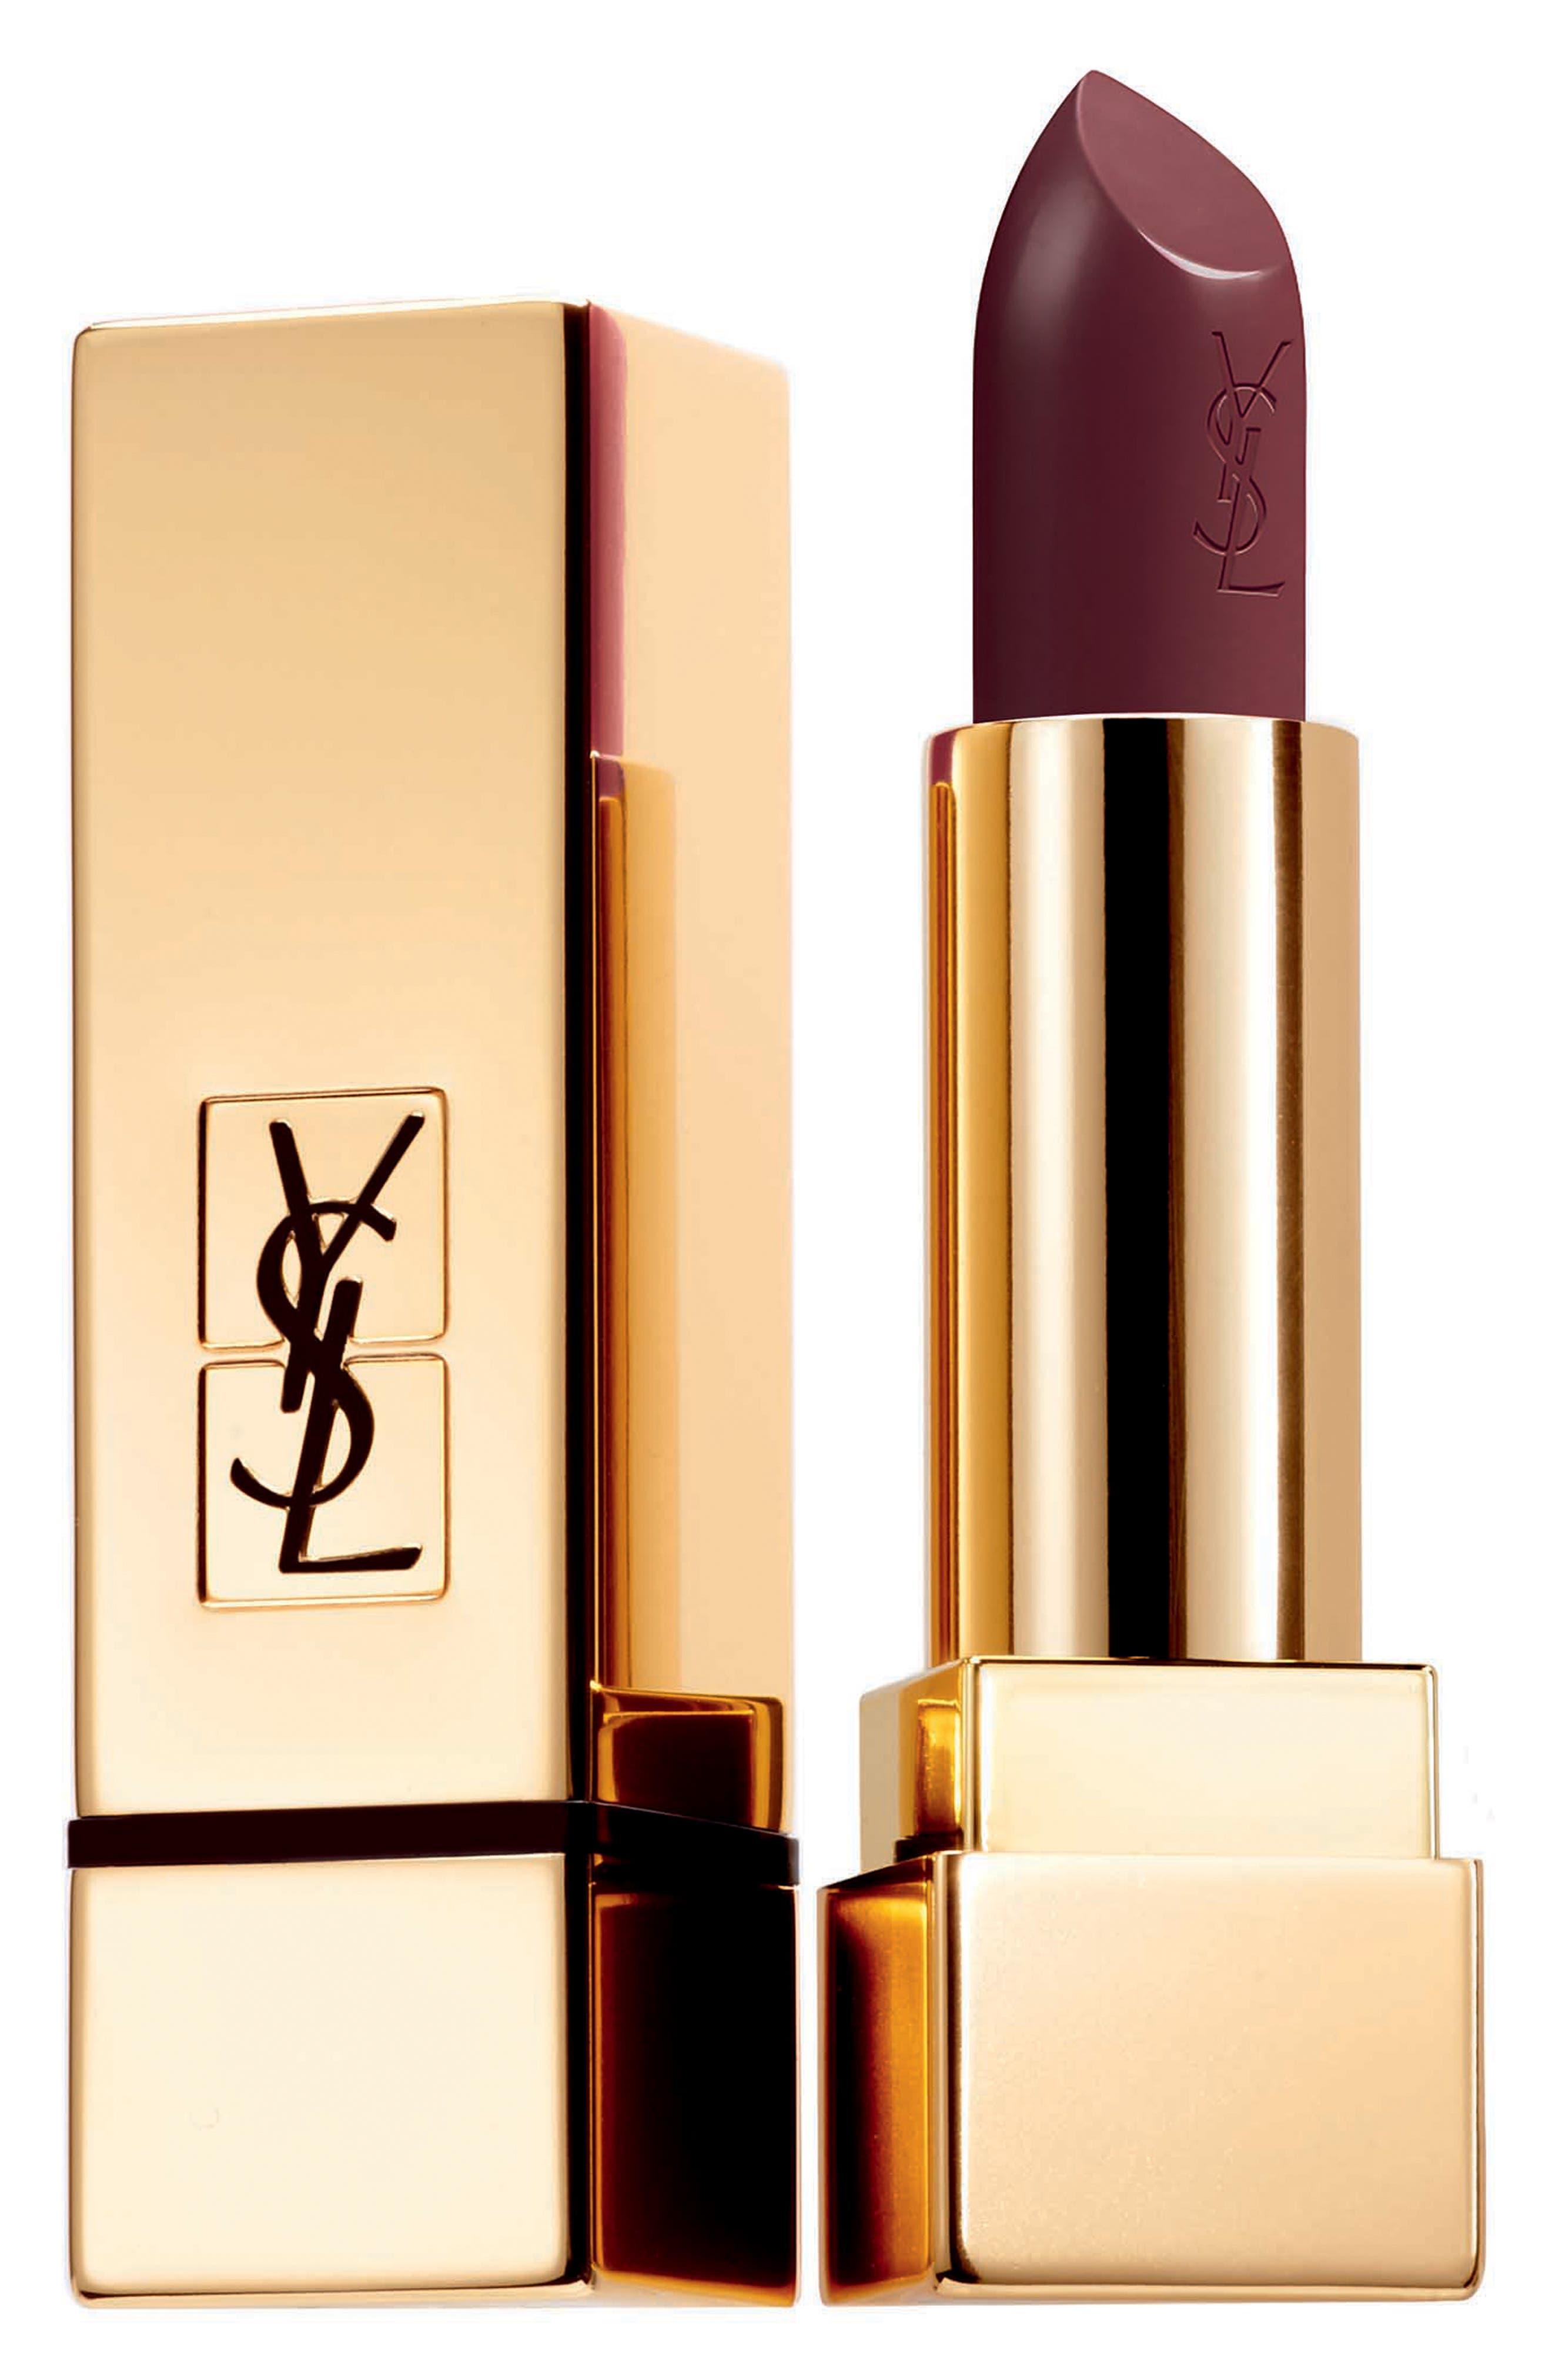 Yves Saint Laurent Rouge Pur Couture Satin Lipstick - 54 Prune Avenue